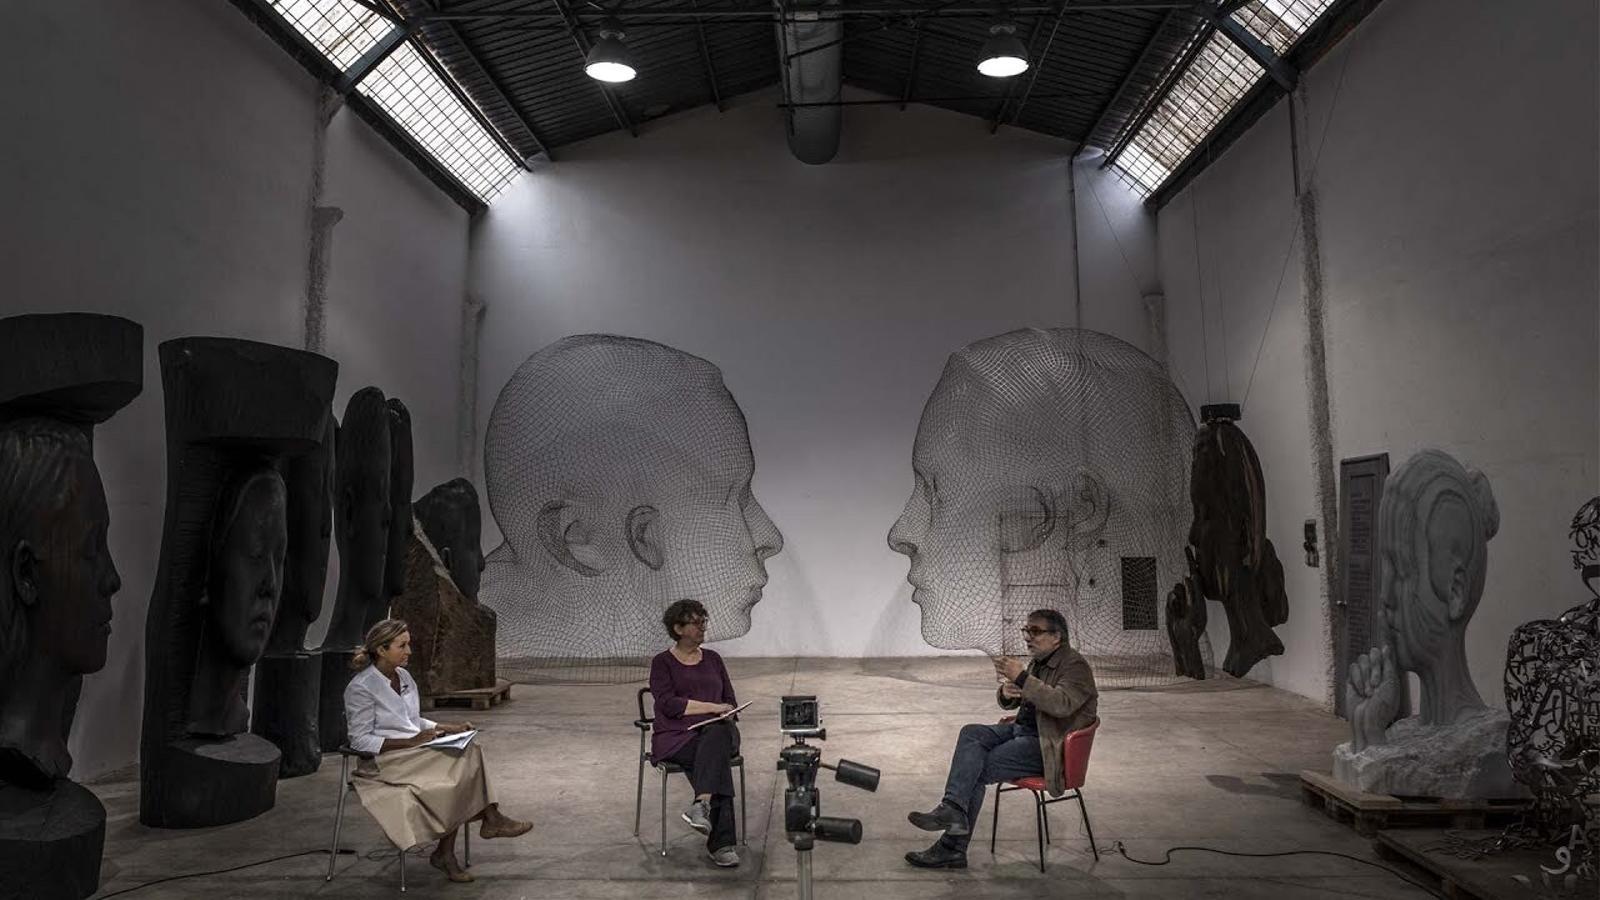 Entrevista d'Esther Vera i Catalina Serra a Jaume Plensa